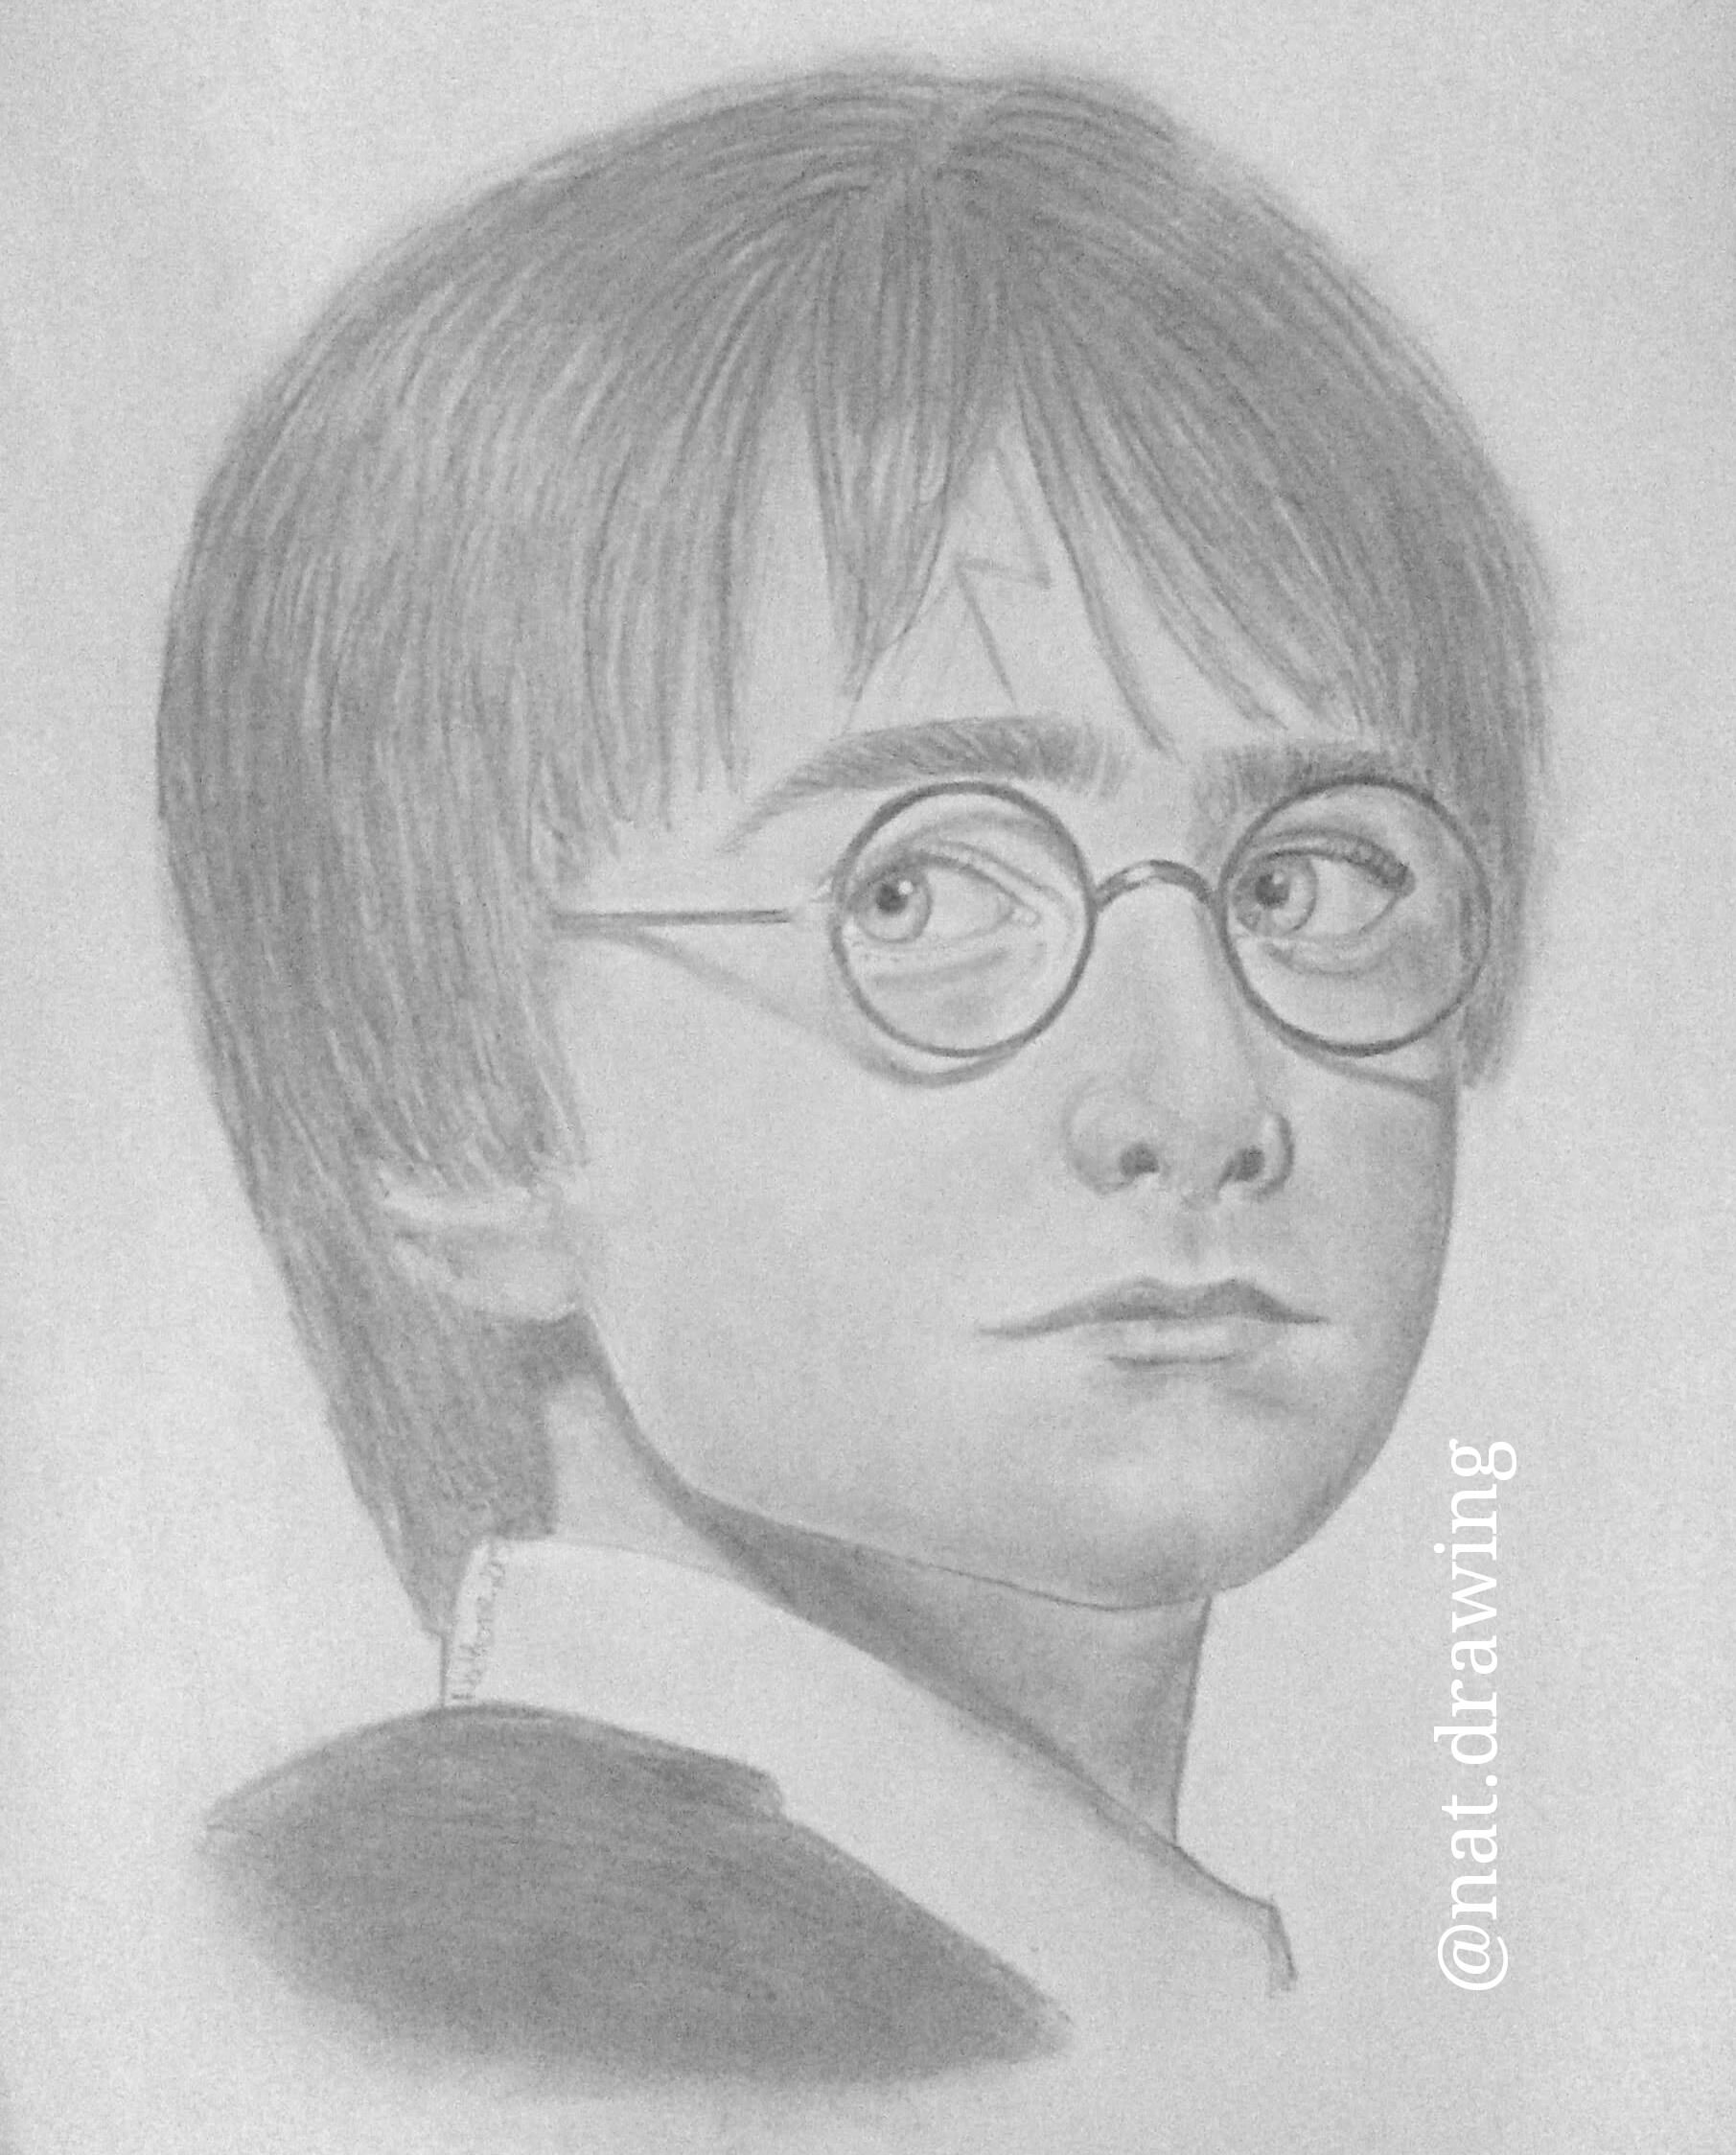 Harry Potter By Nat-drawing On DeviantArt